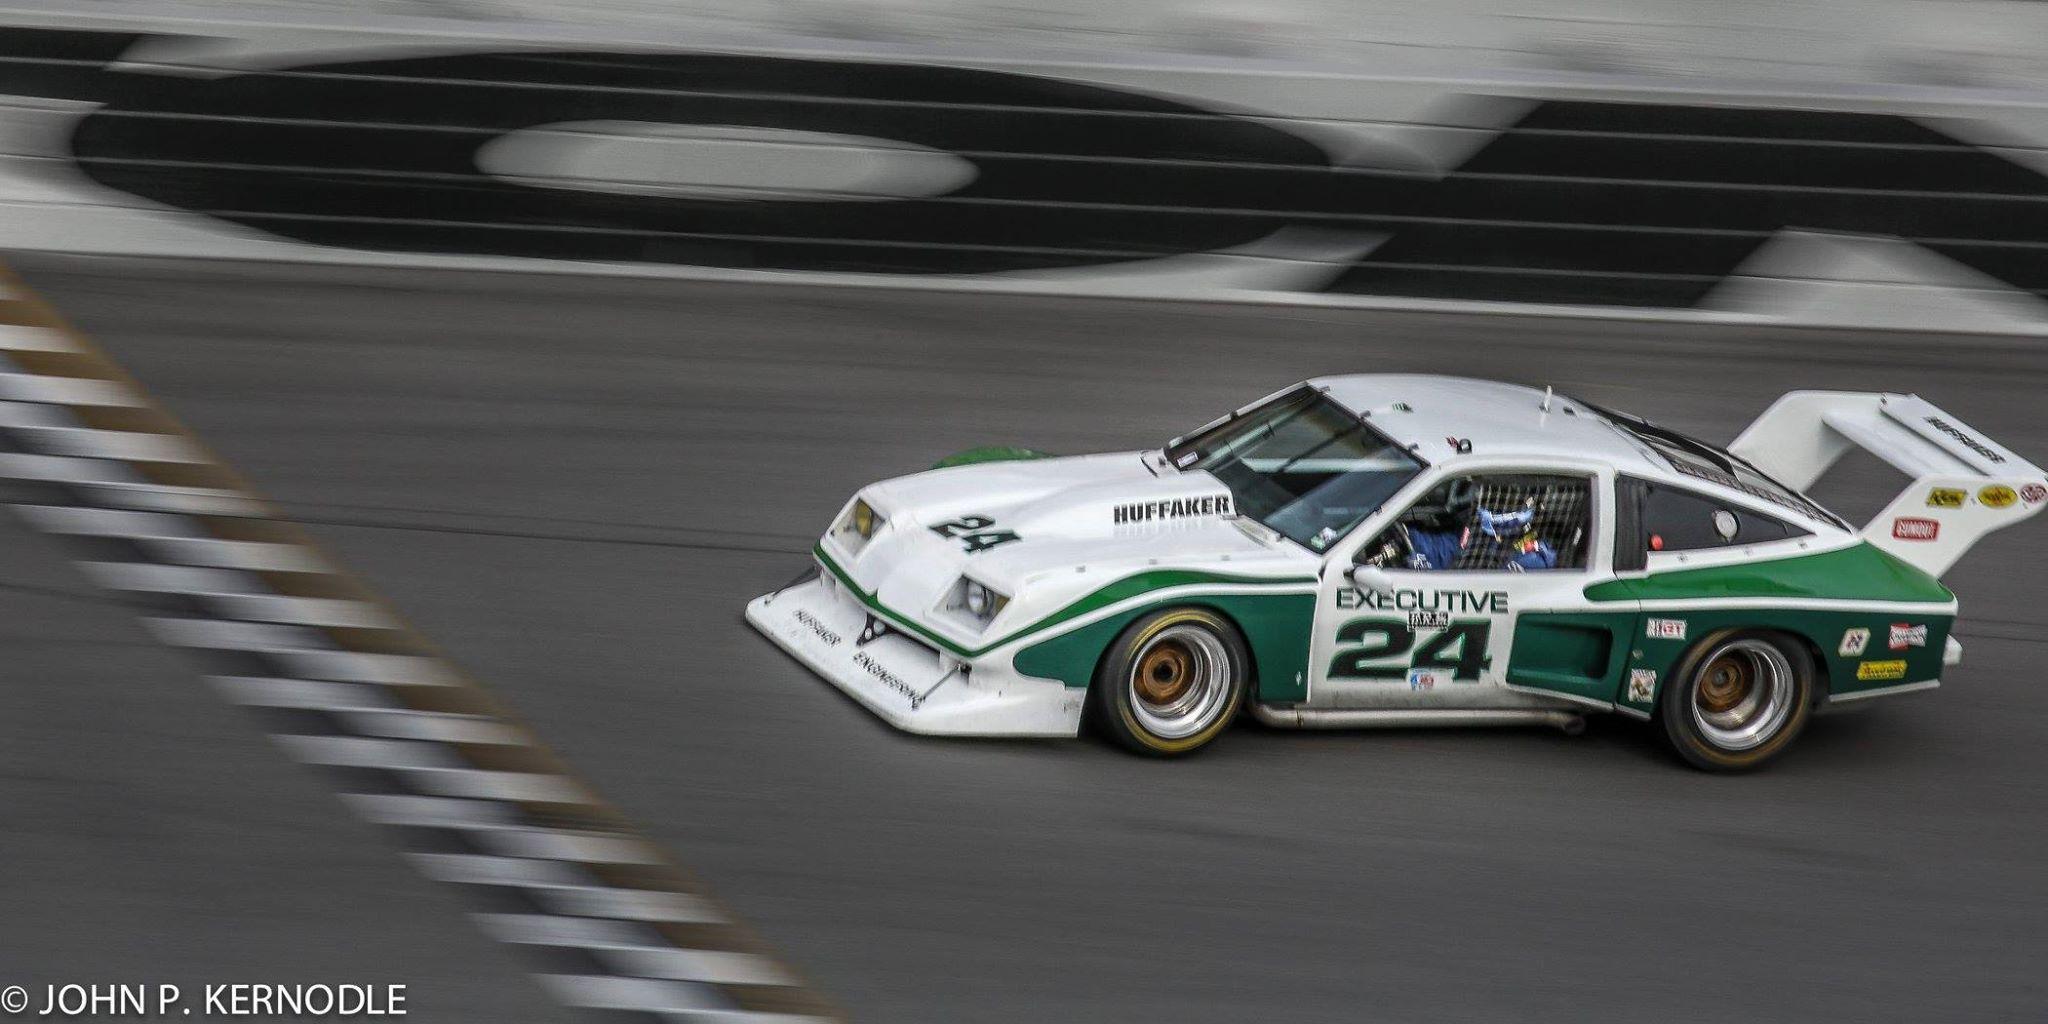 2015 Classic 24 At Daytona Presented By Imsa 1976 Dekon Monza 5997 Cc Chevy V8 Driven By Pat Kiel Hogan John Longwell Jim Valdez Photo By John Kernd